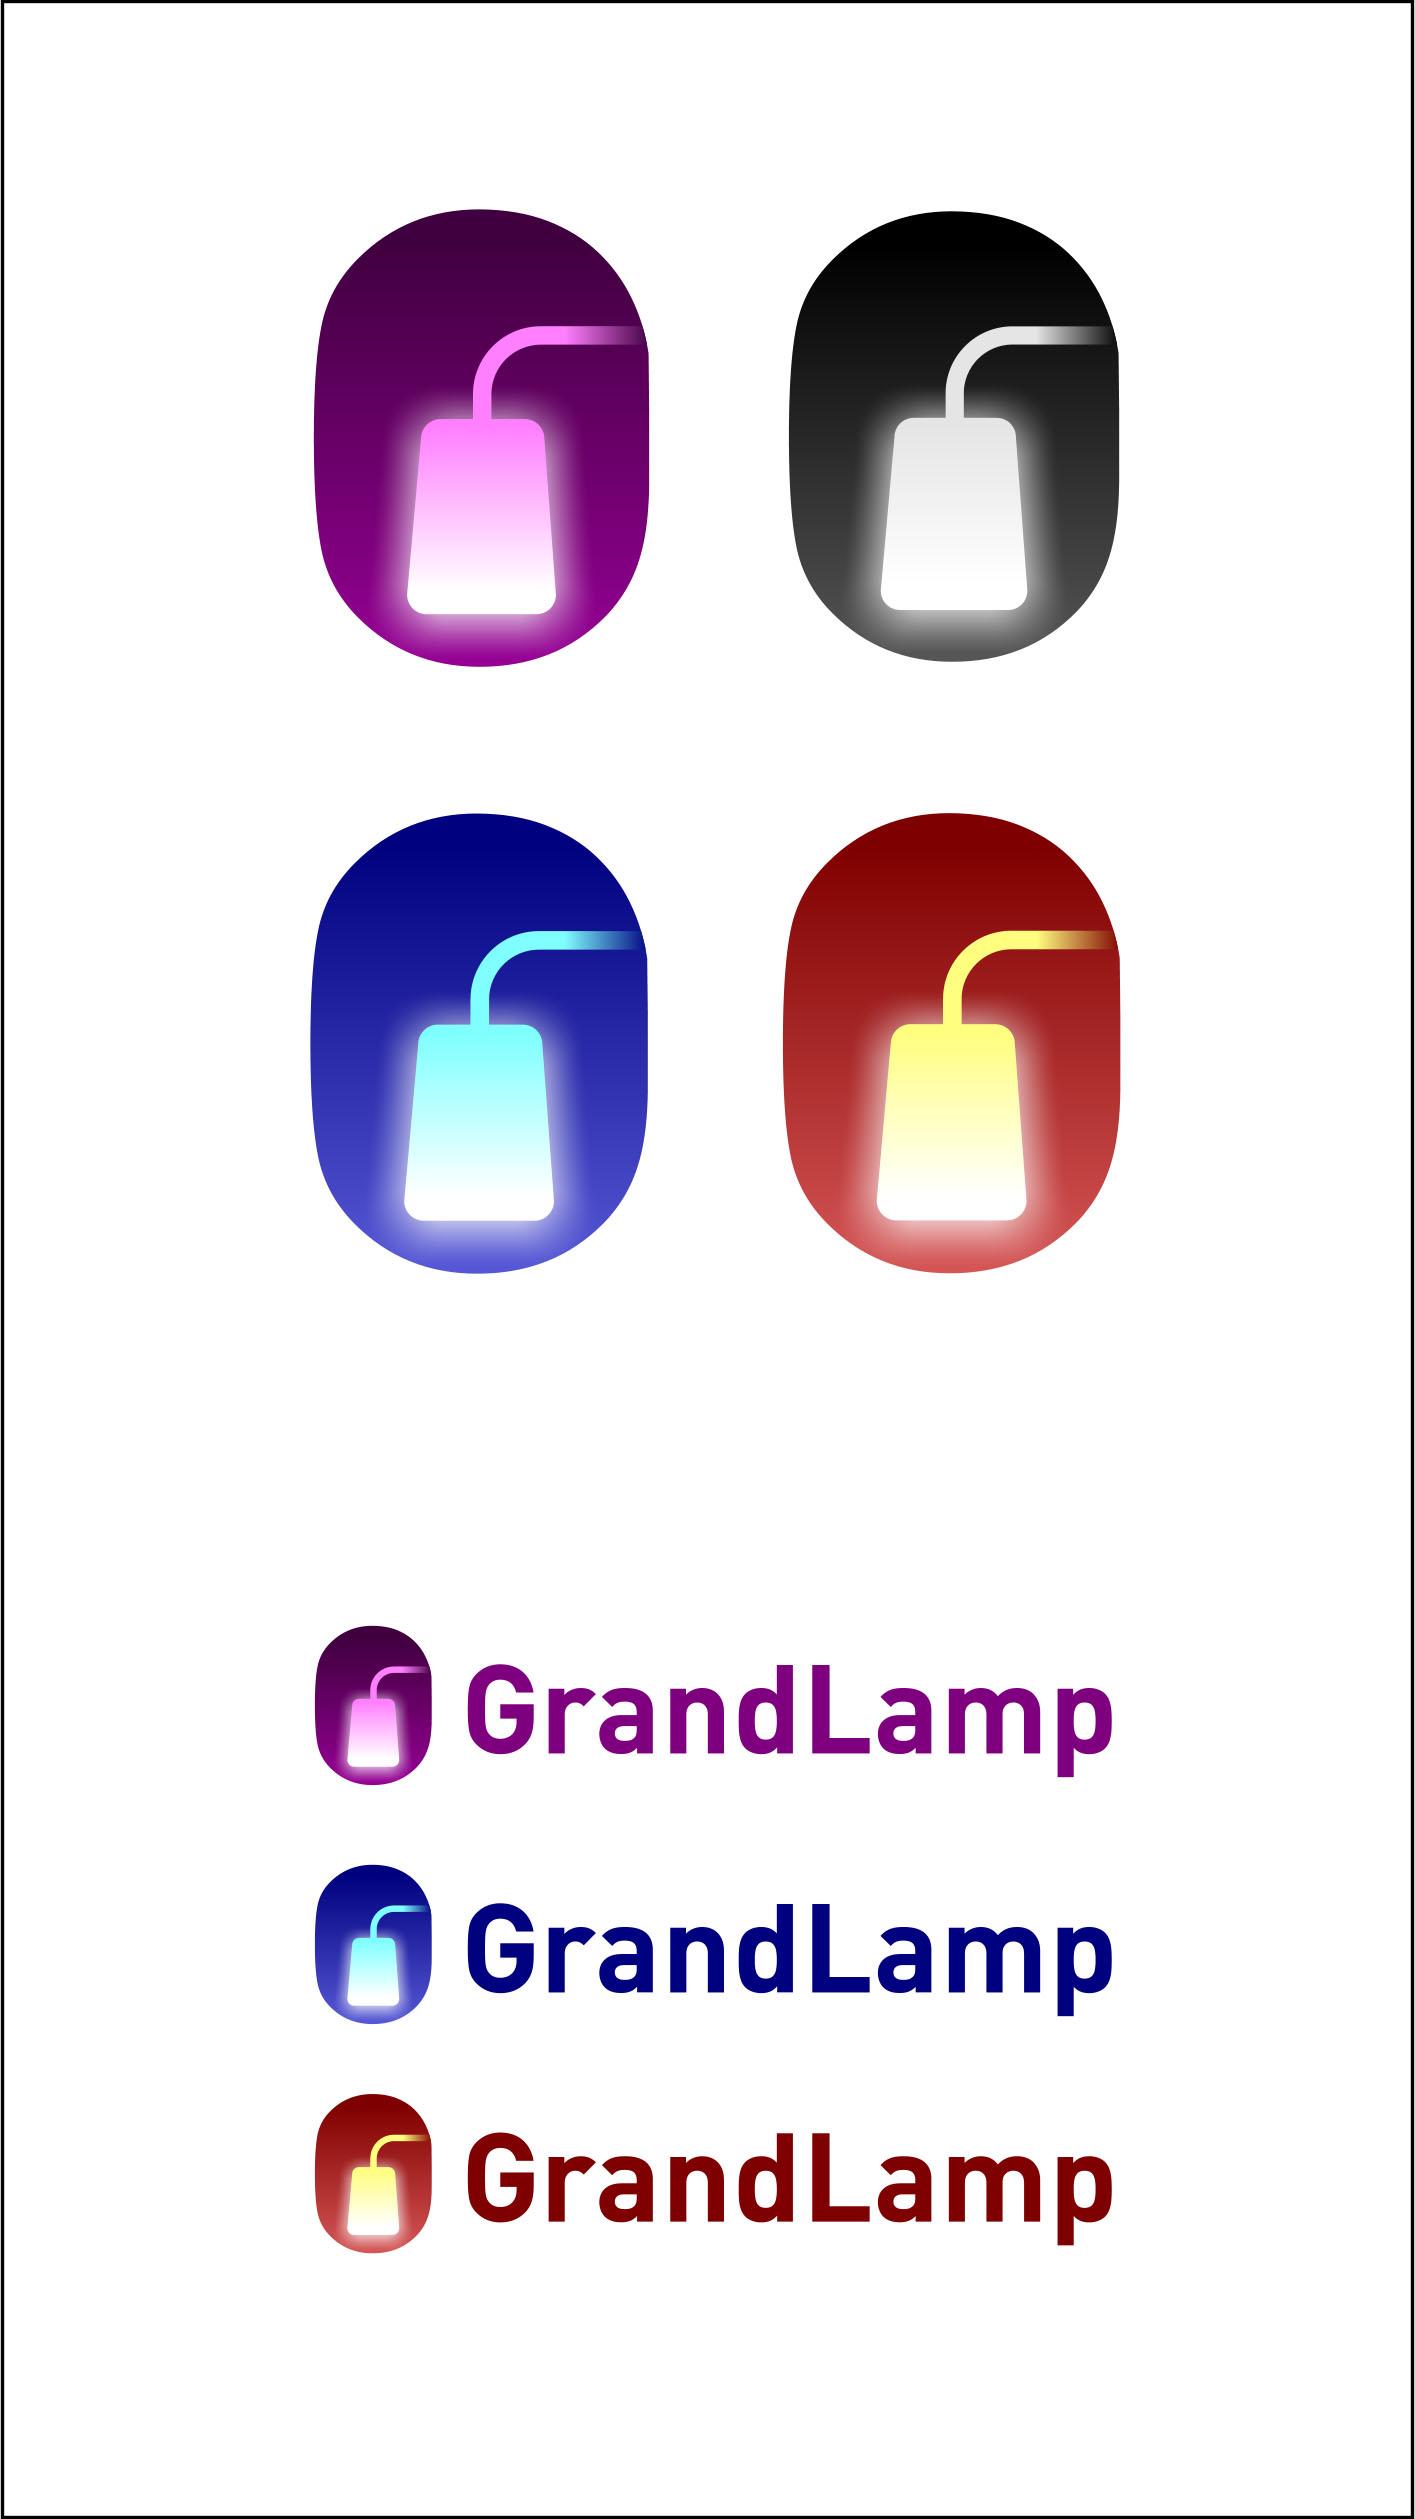 Разработка логотипа и элементов фирменного стиля фото f_10257ead80a298bd.jpg